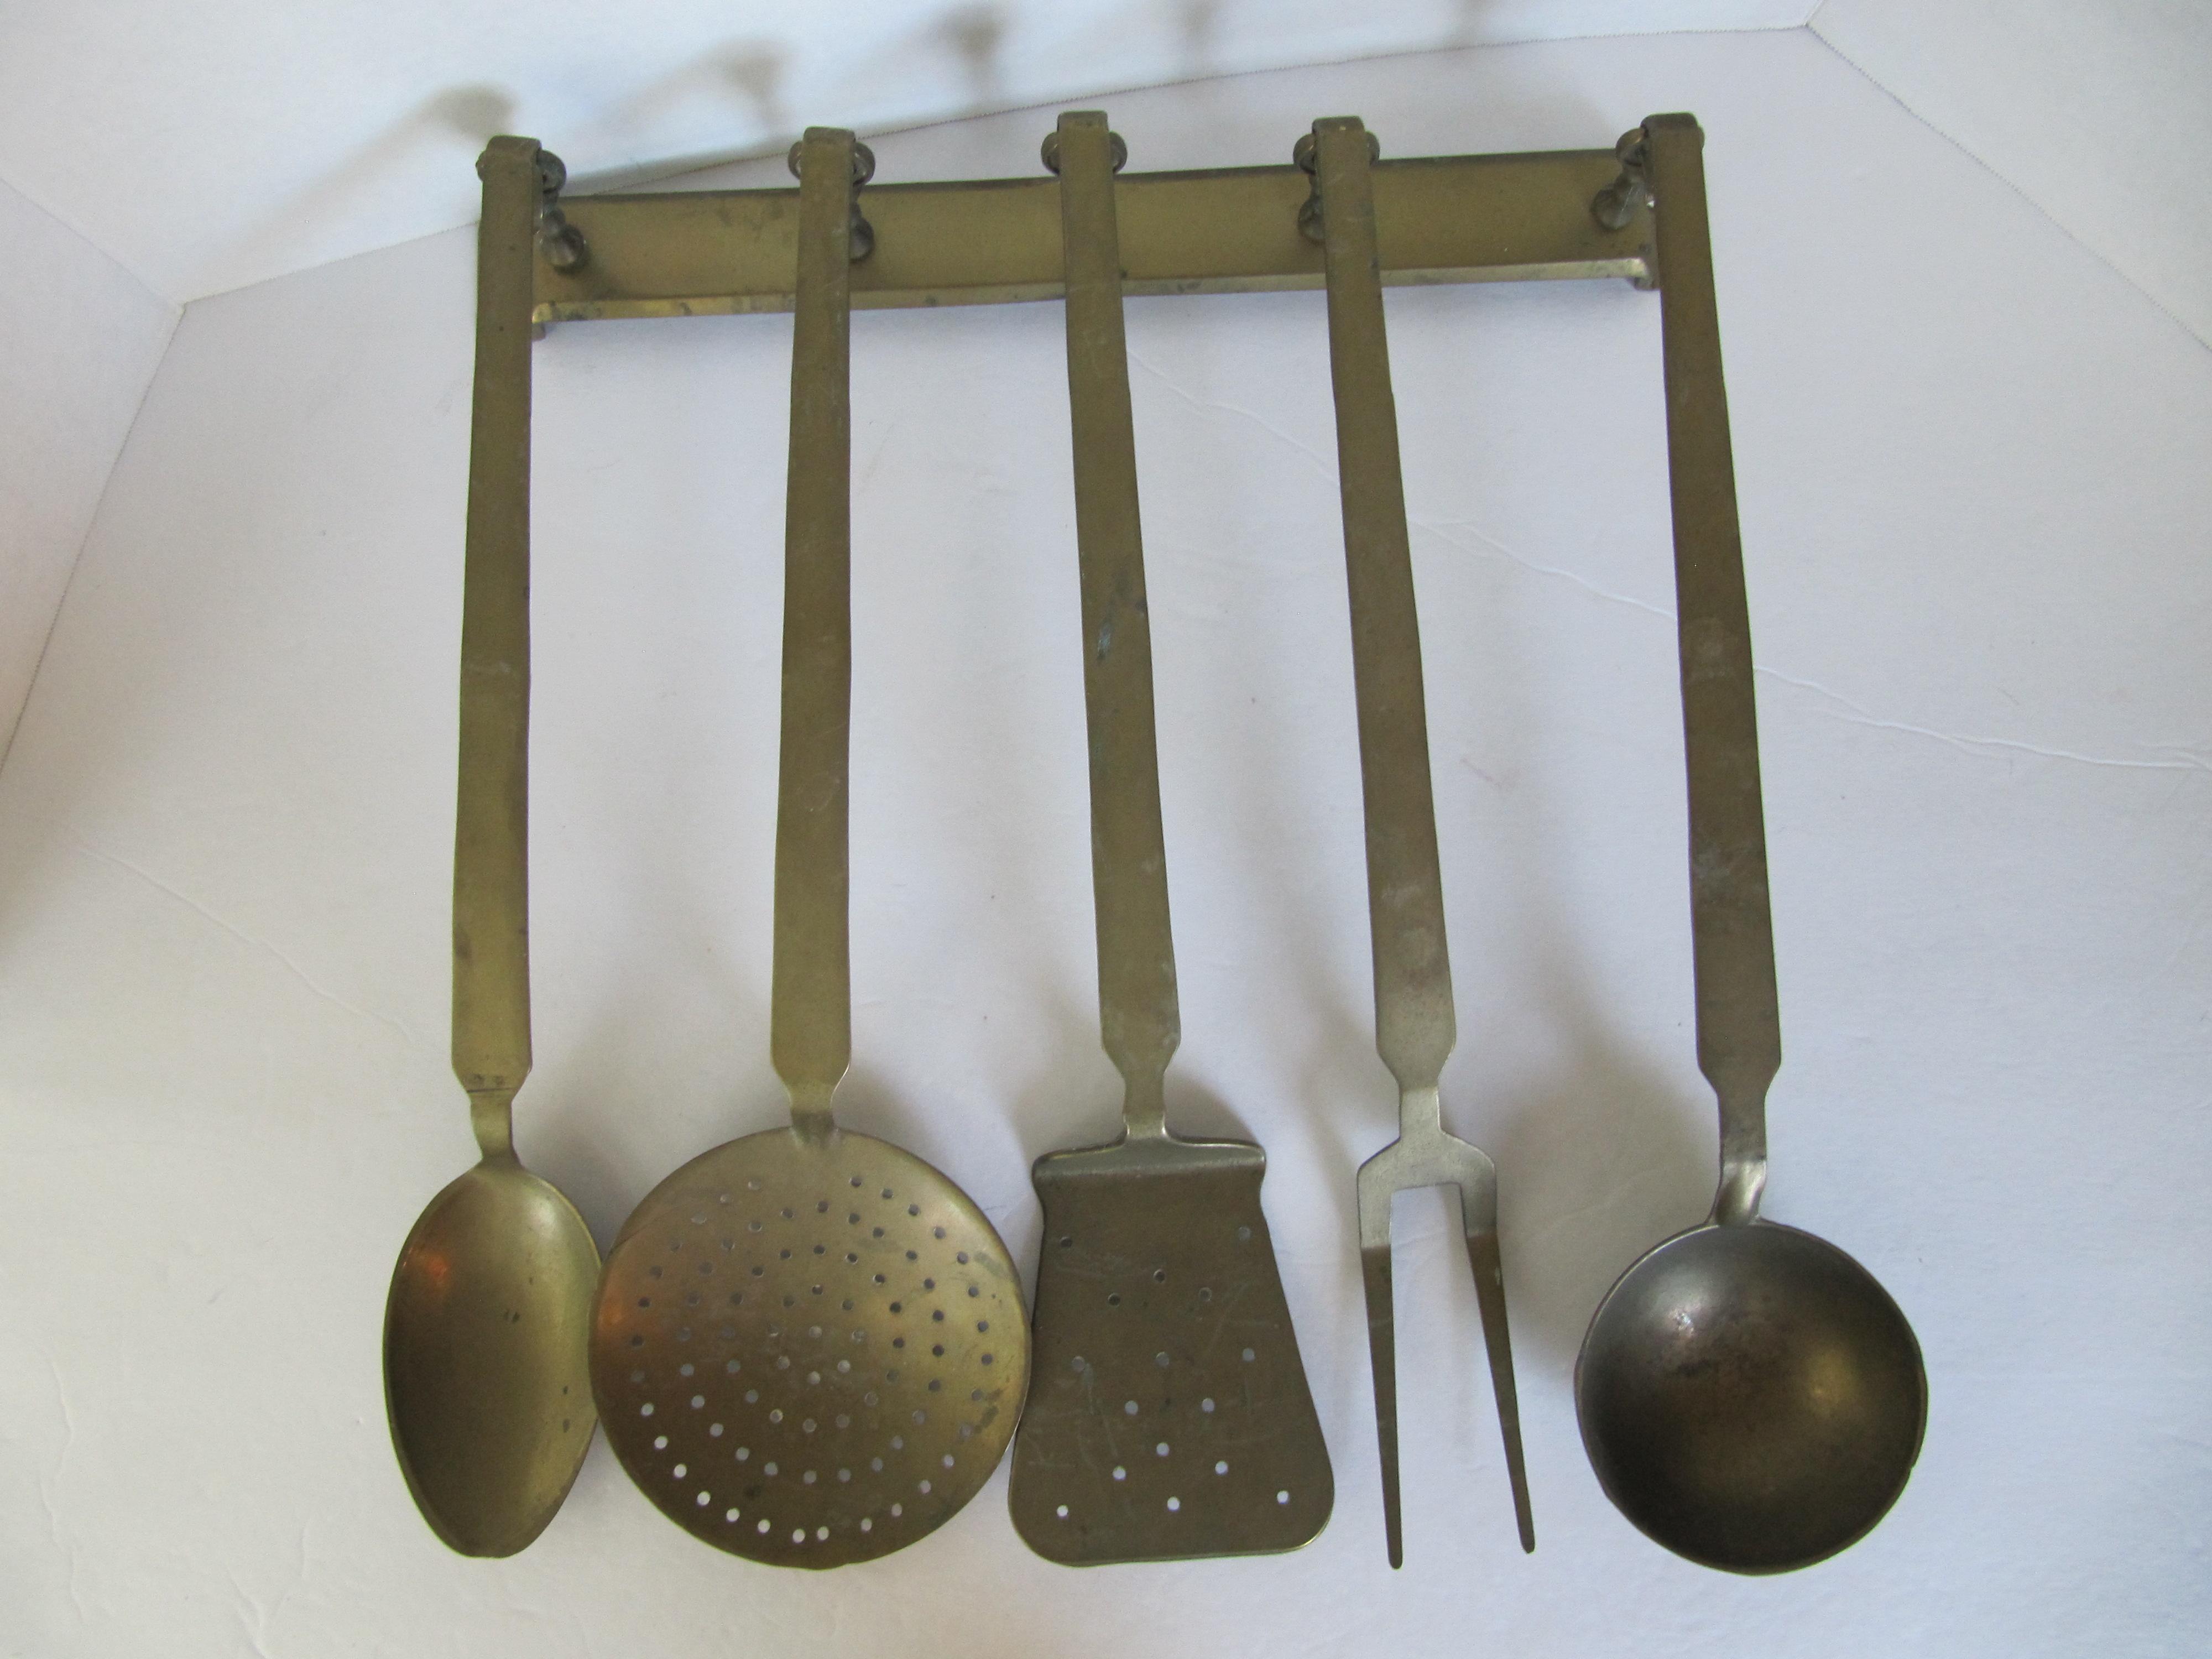 Vintage Hanging Brass Utensils   Set Of 5   Image 2 Of 7